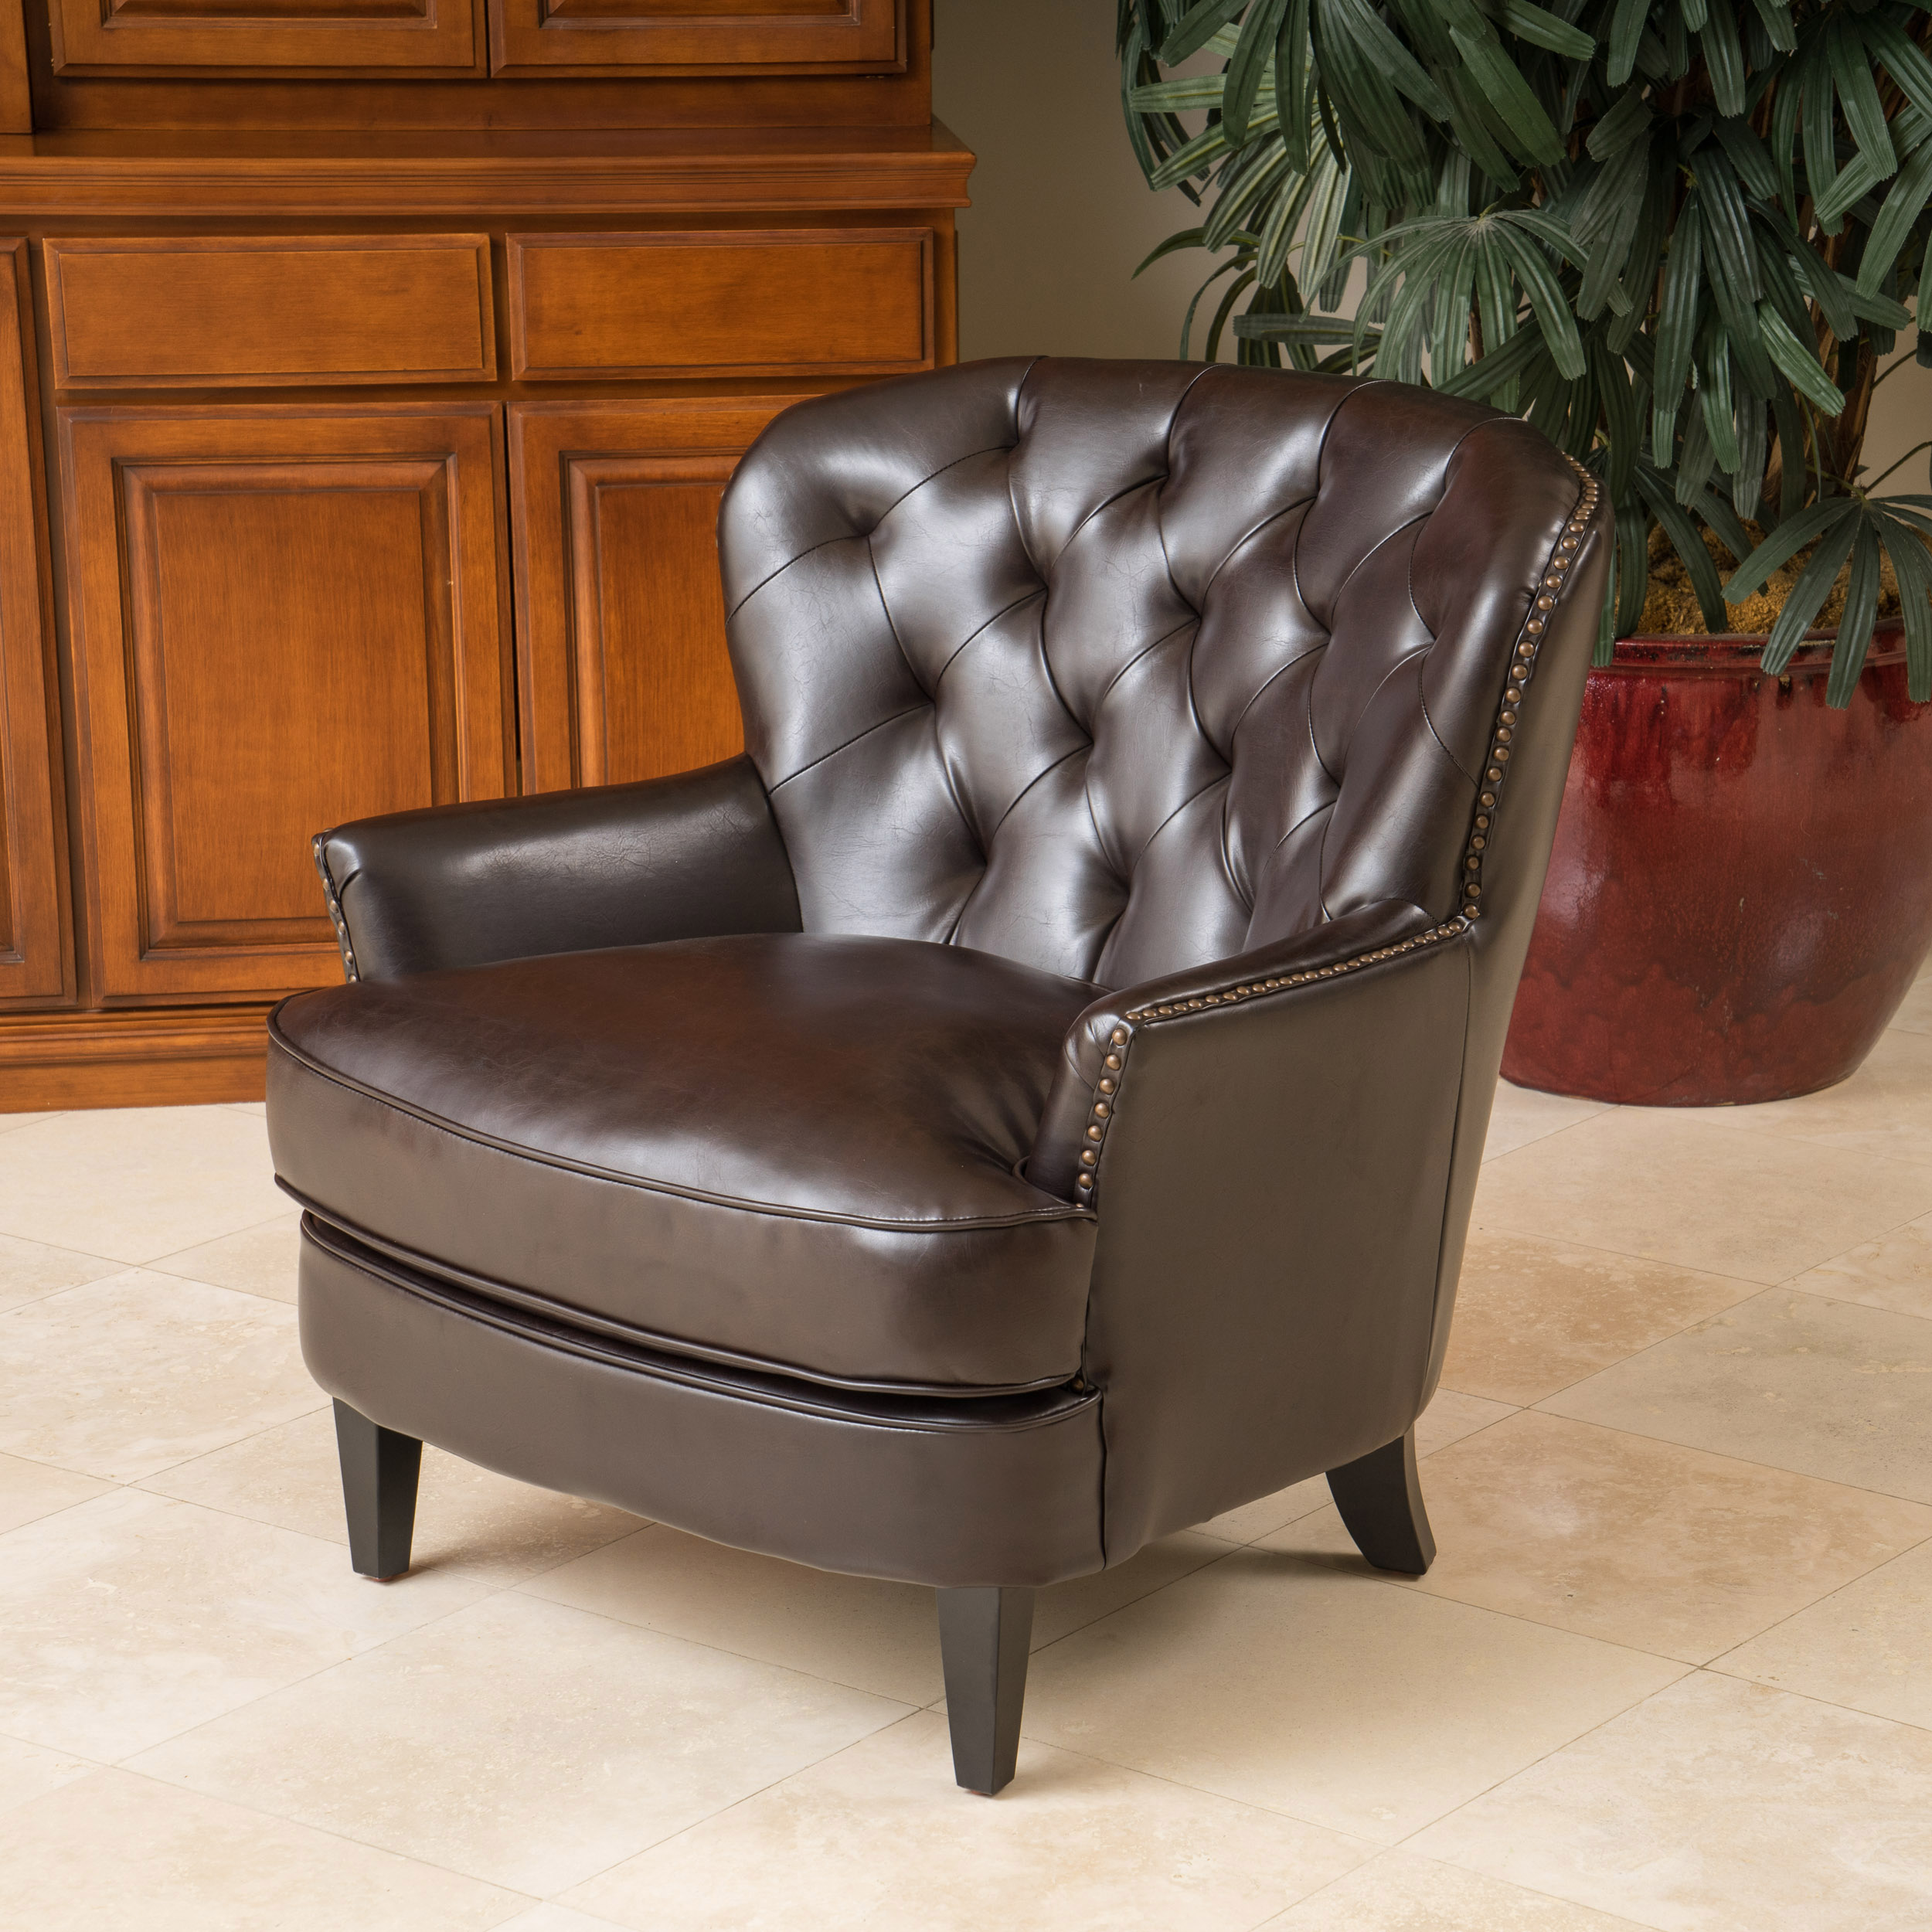 Noble House Brandy Diamond Tufted Club Chair, Brown